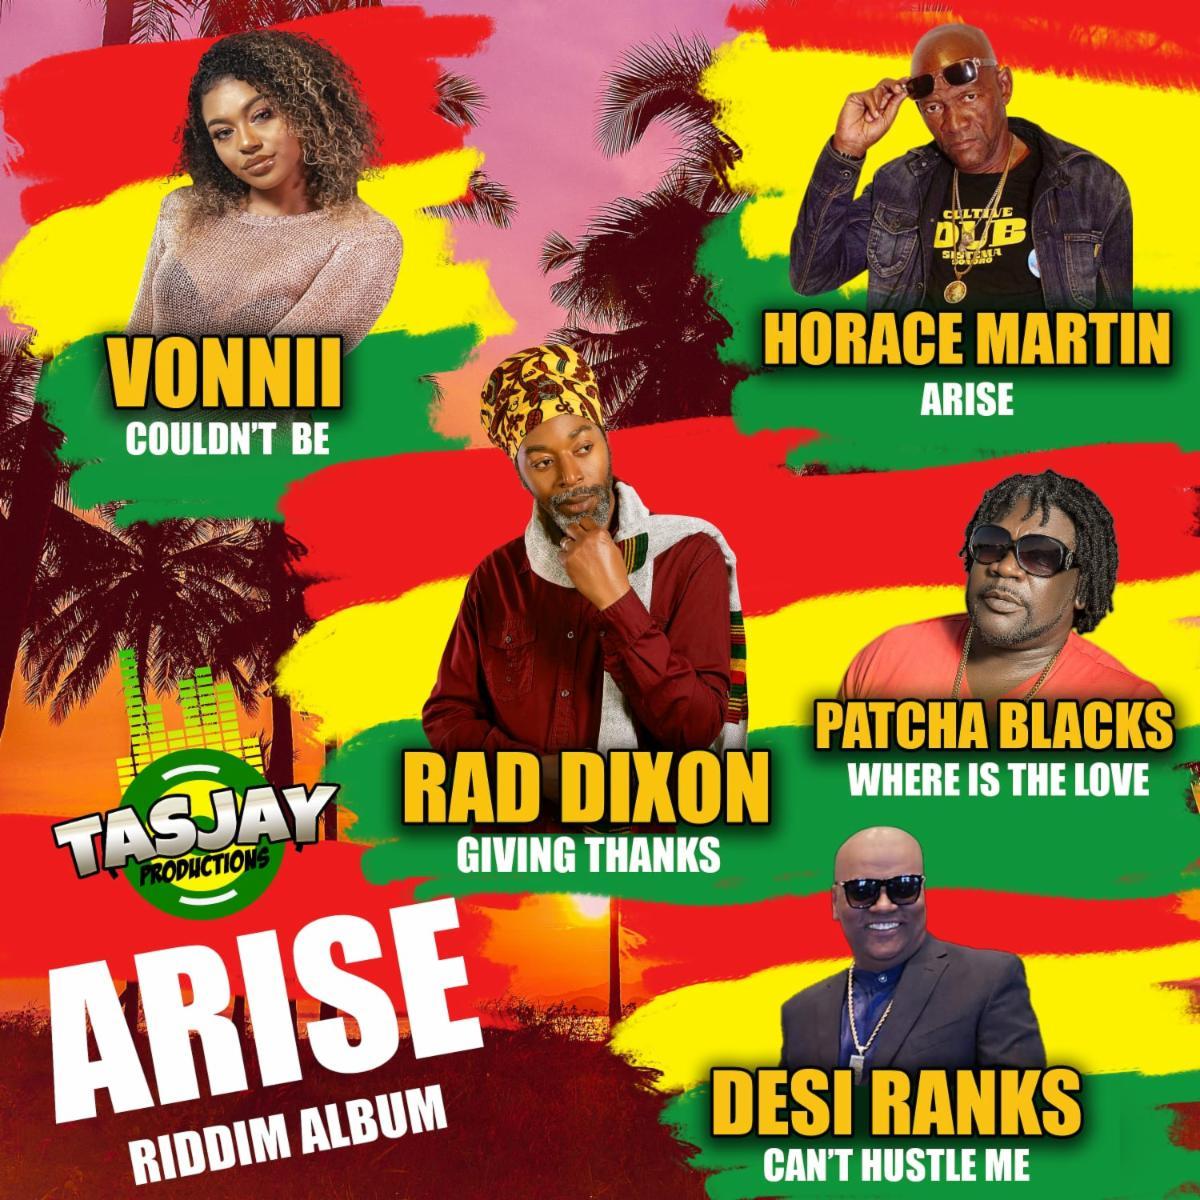 Tasjay Productions Present: Arise Riddim